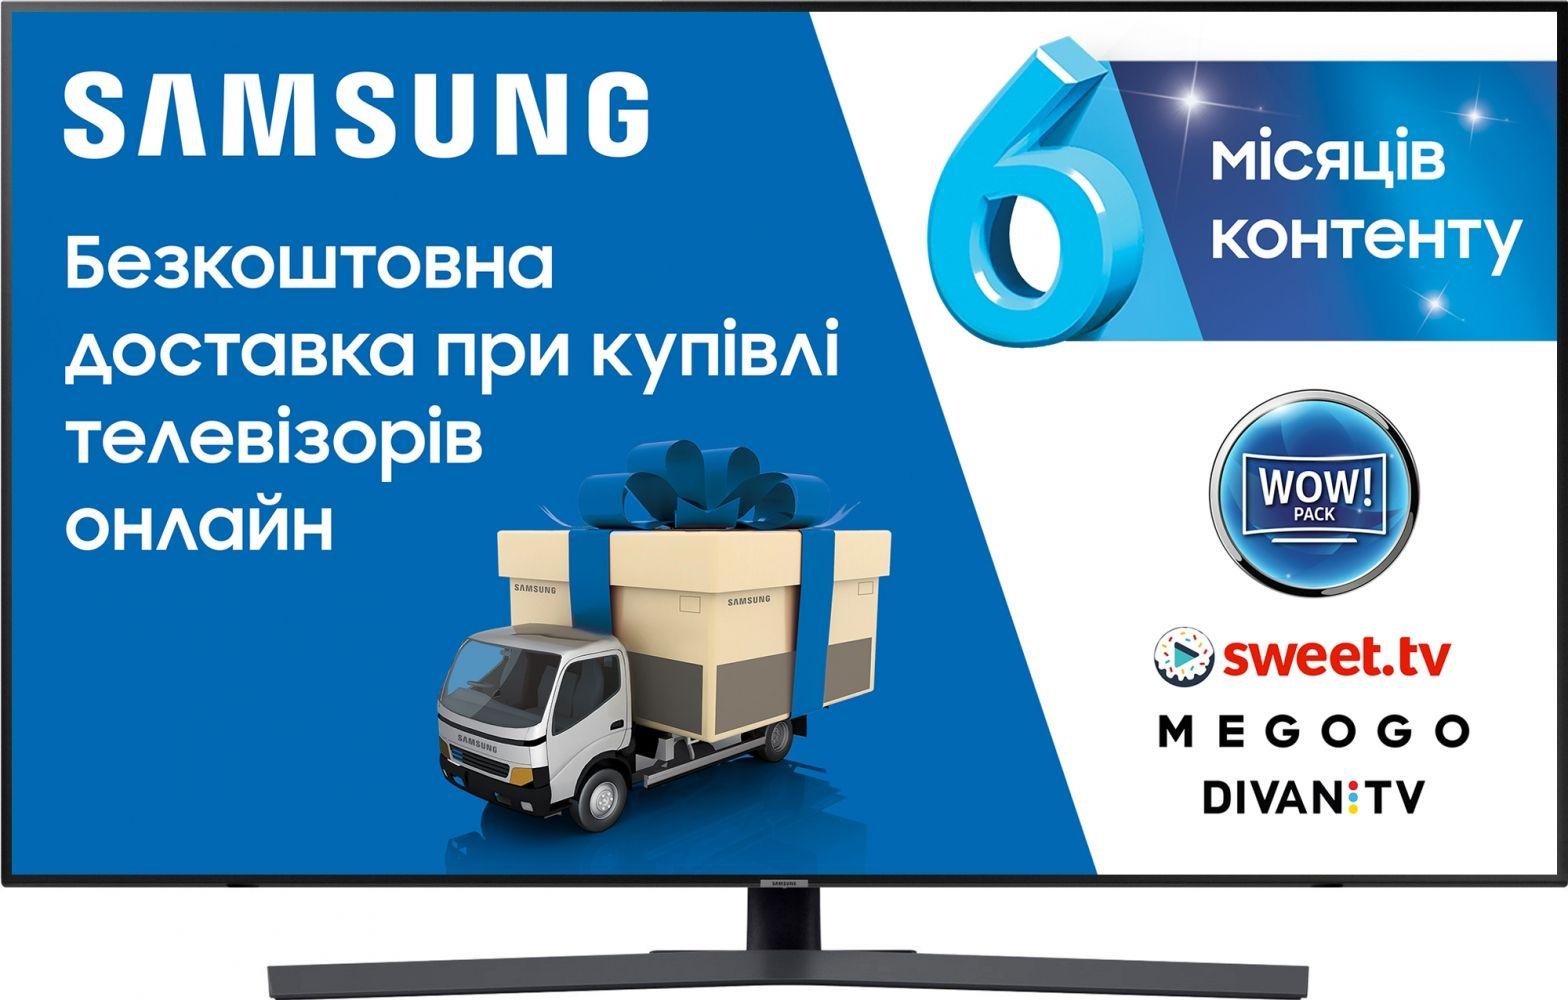 Купить Телевизоры, Телевизор SAMSUNG UE55RU7200UXUA